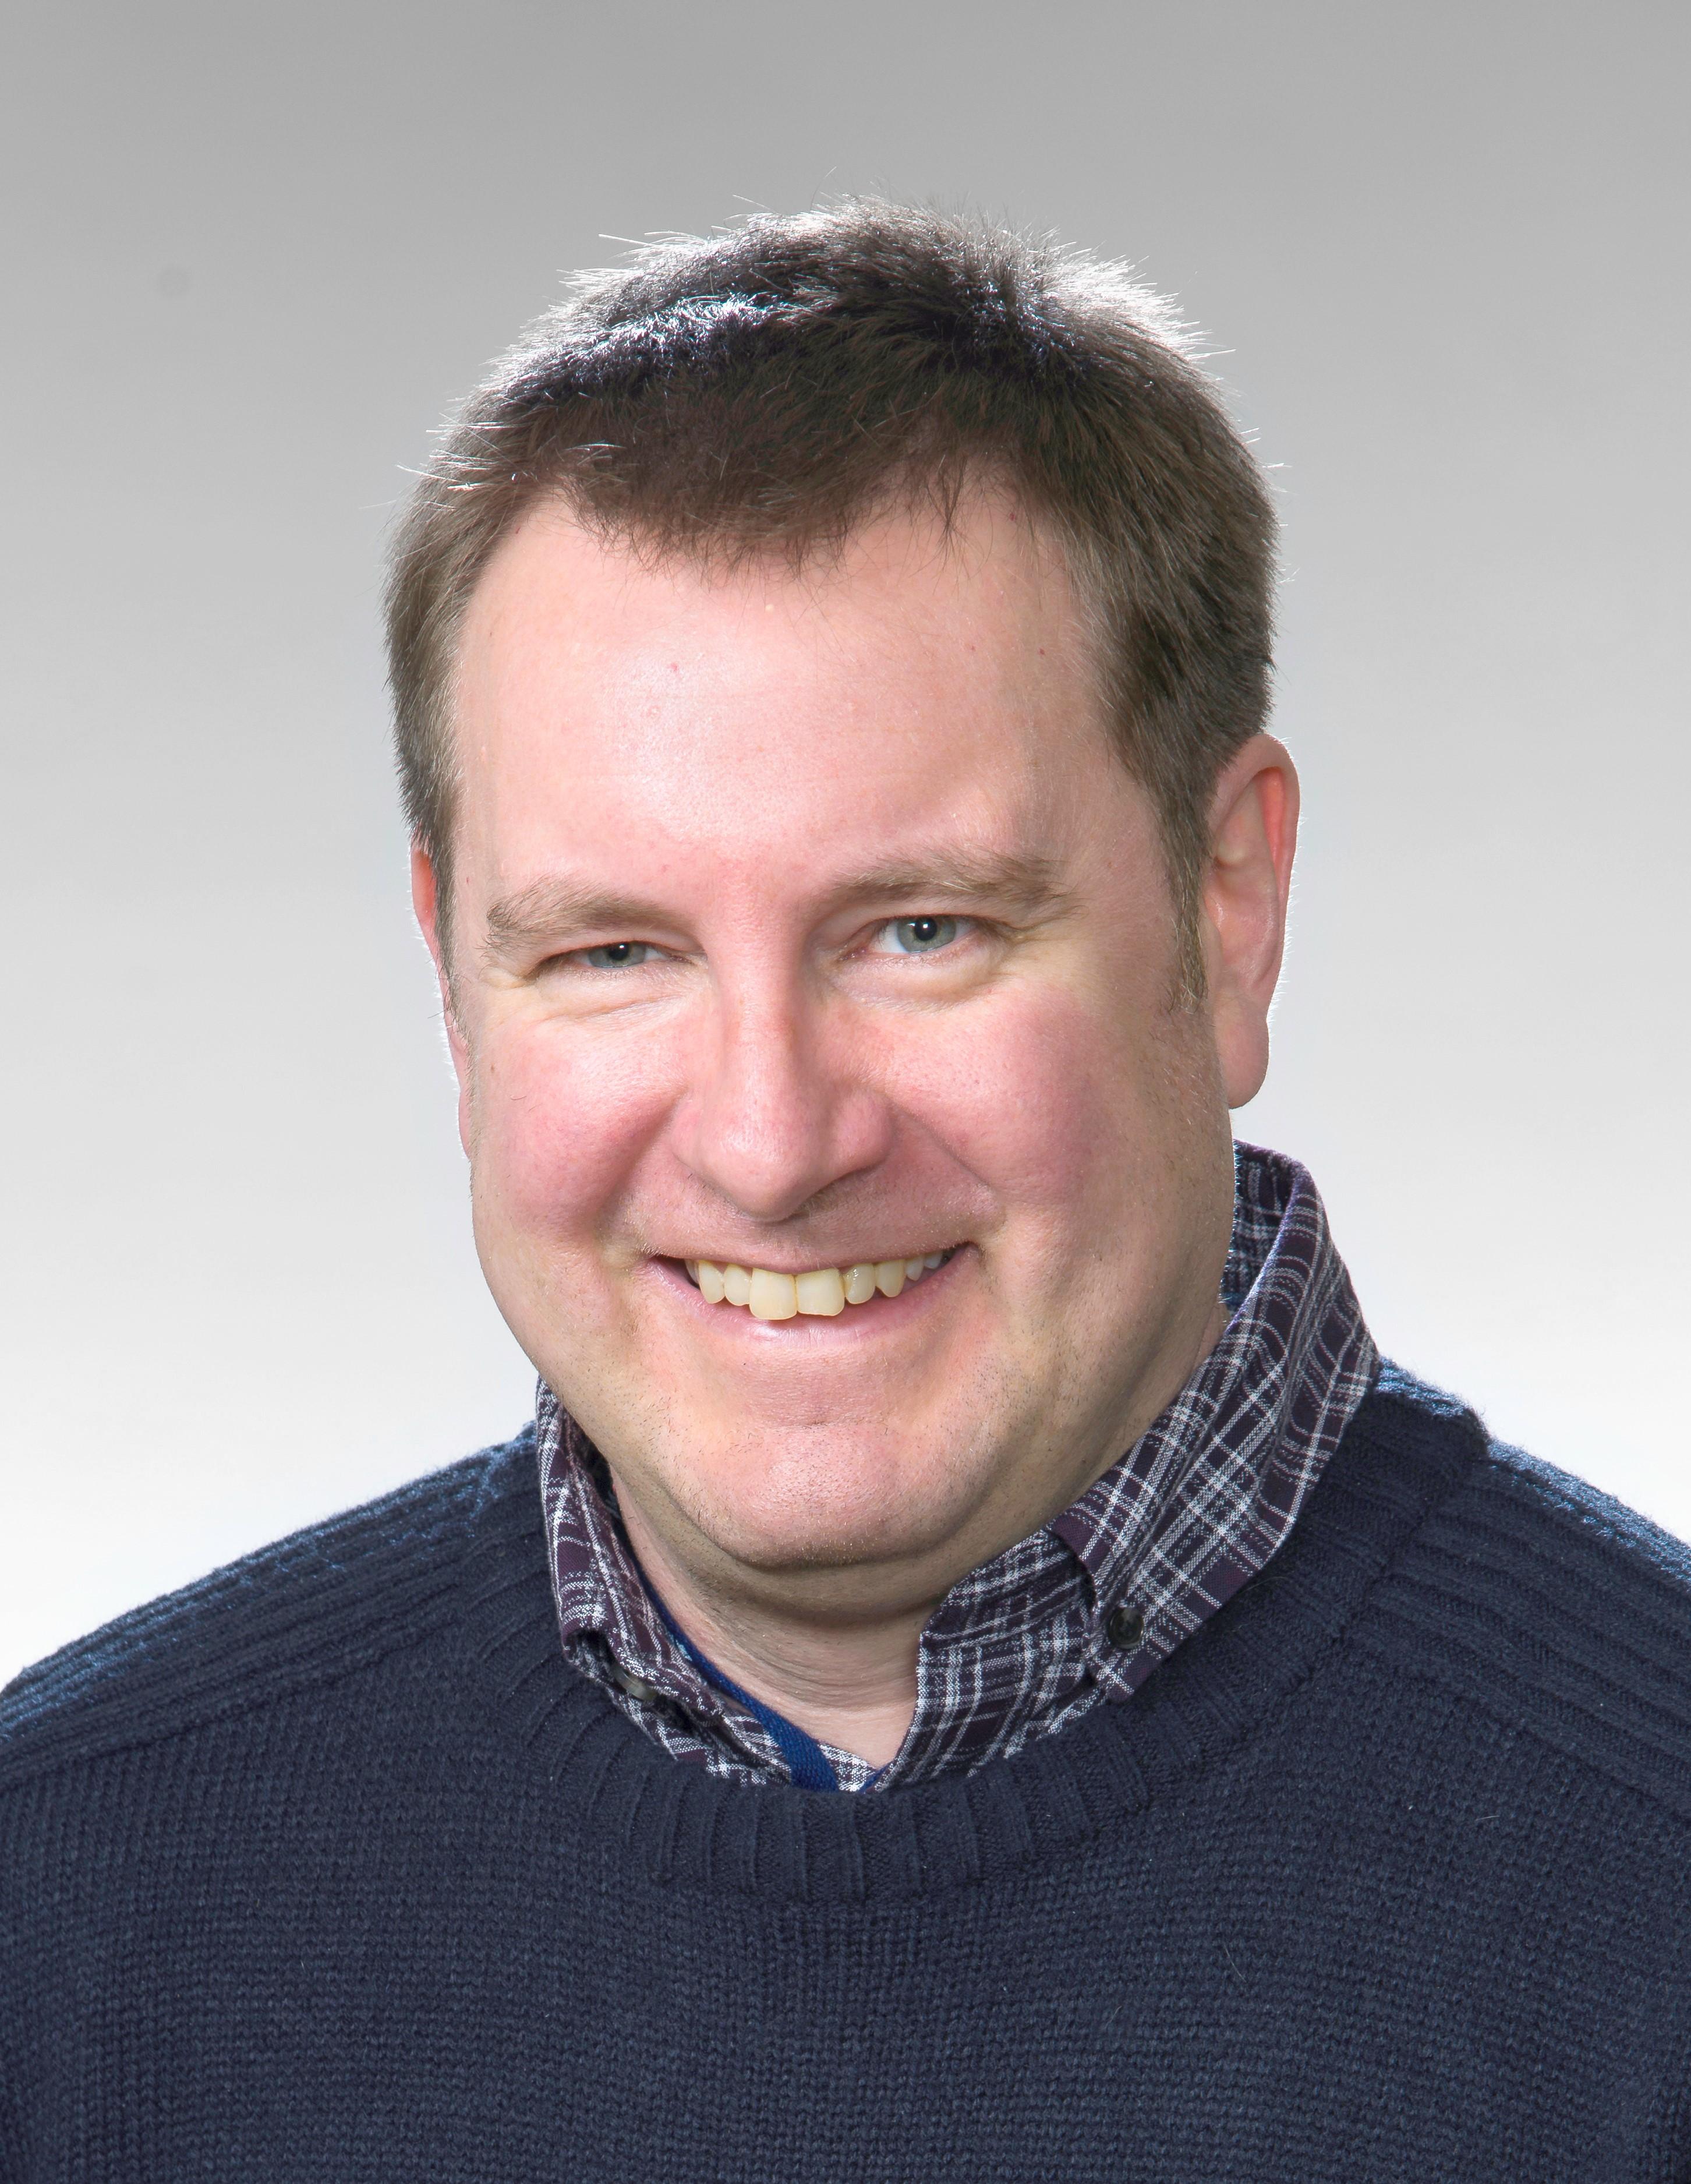 Steve Wilcockson